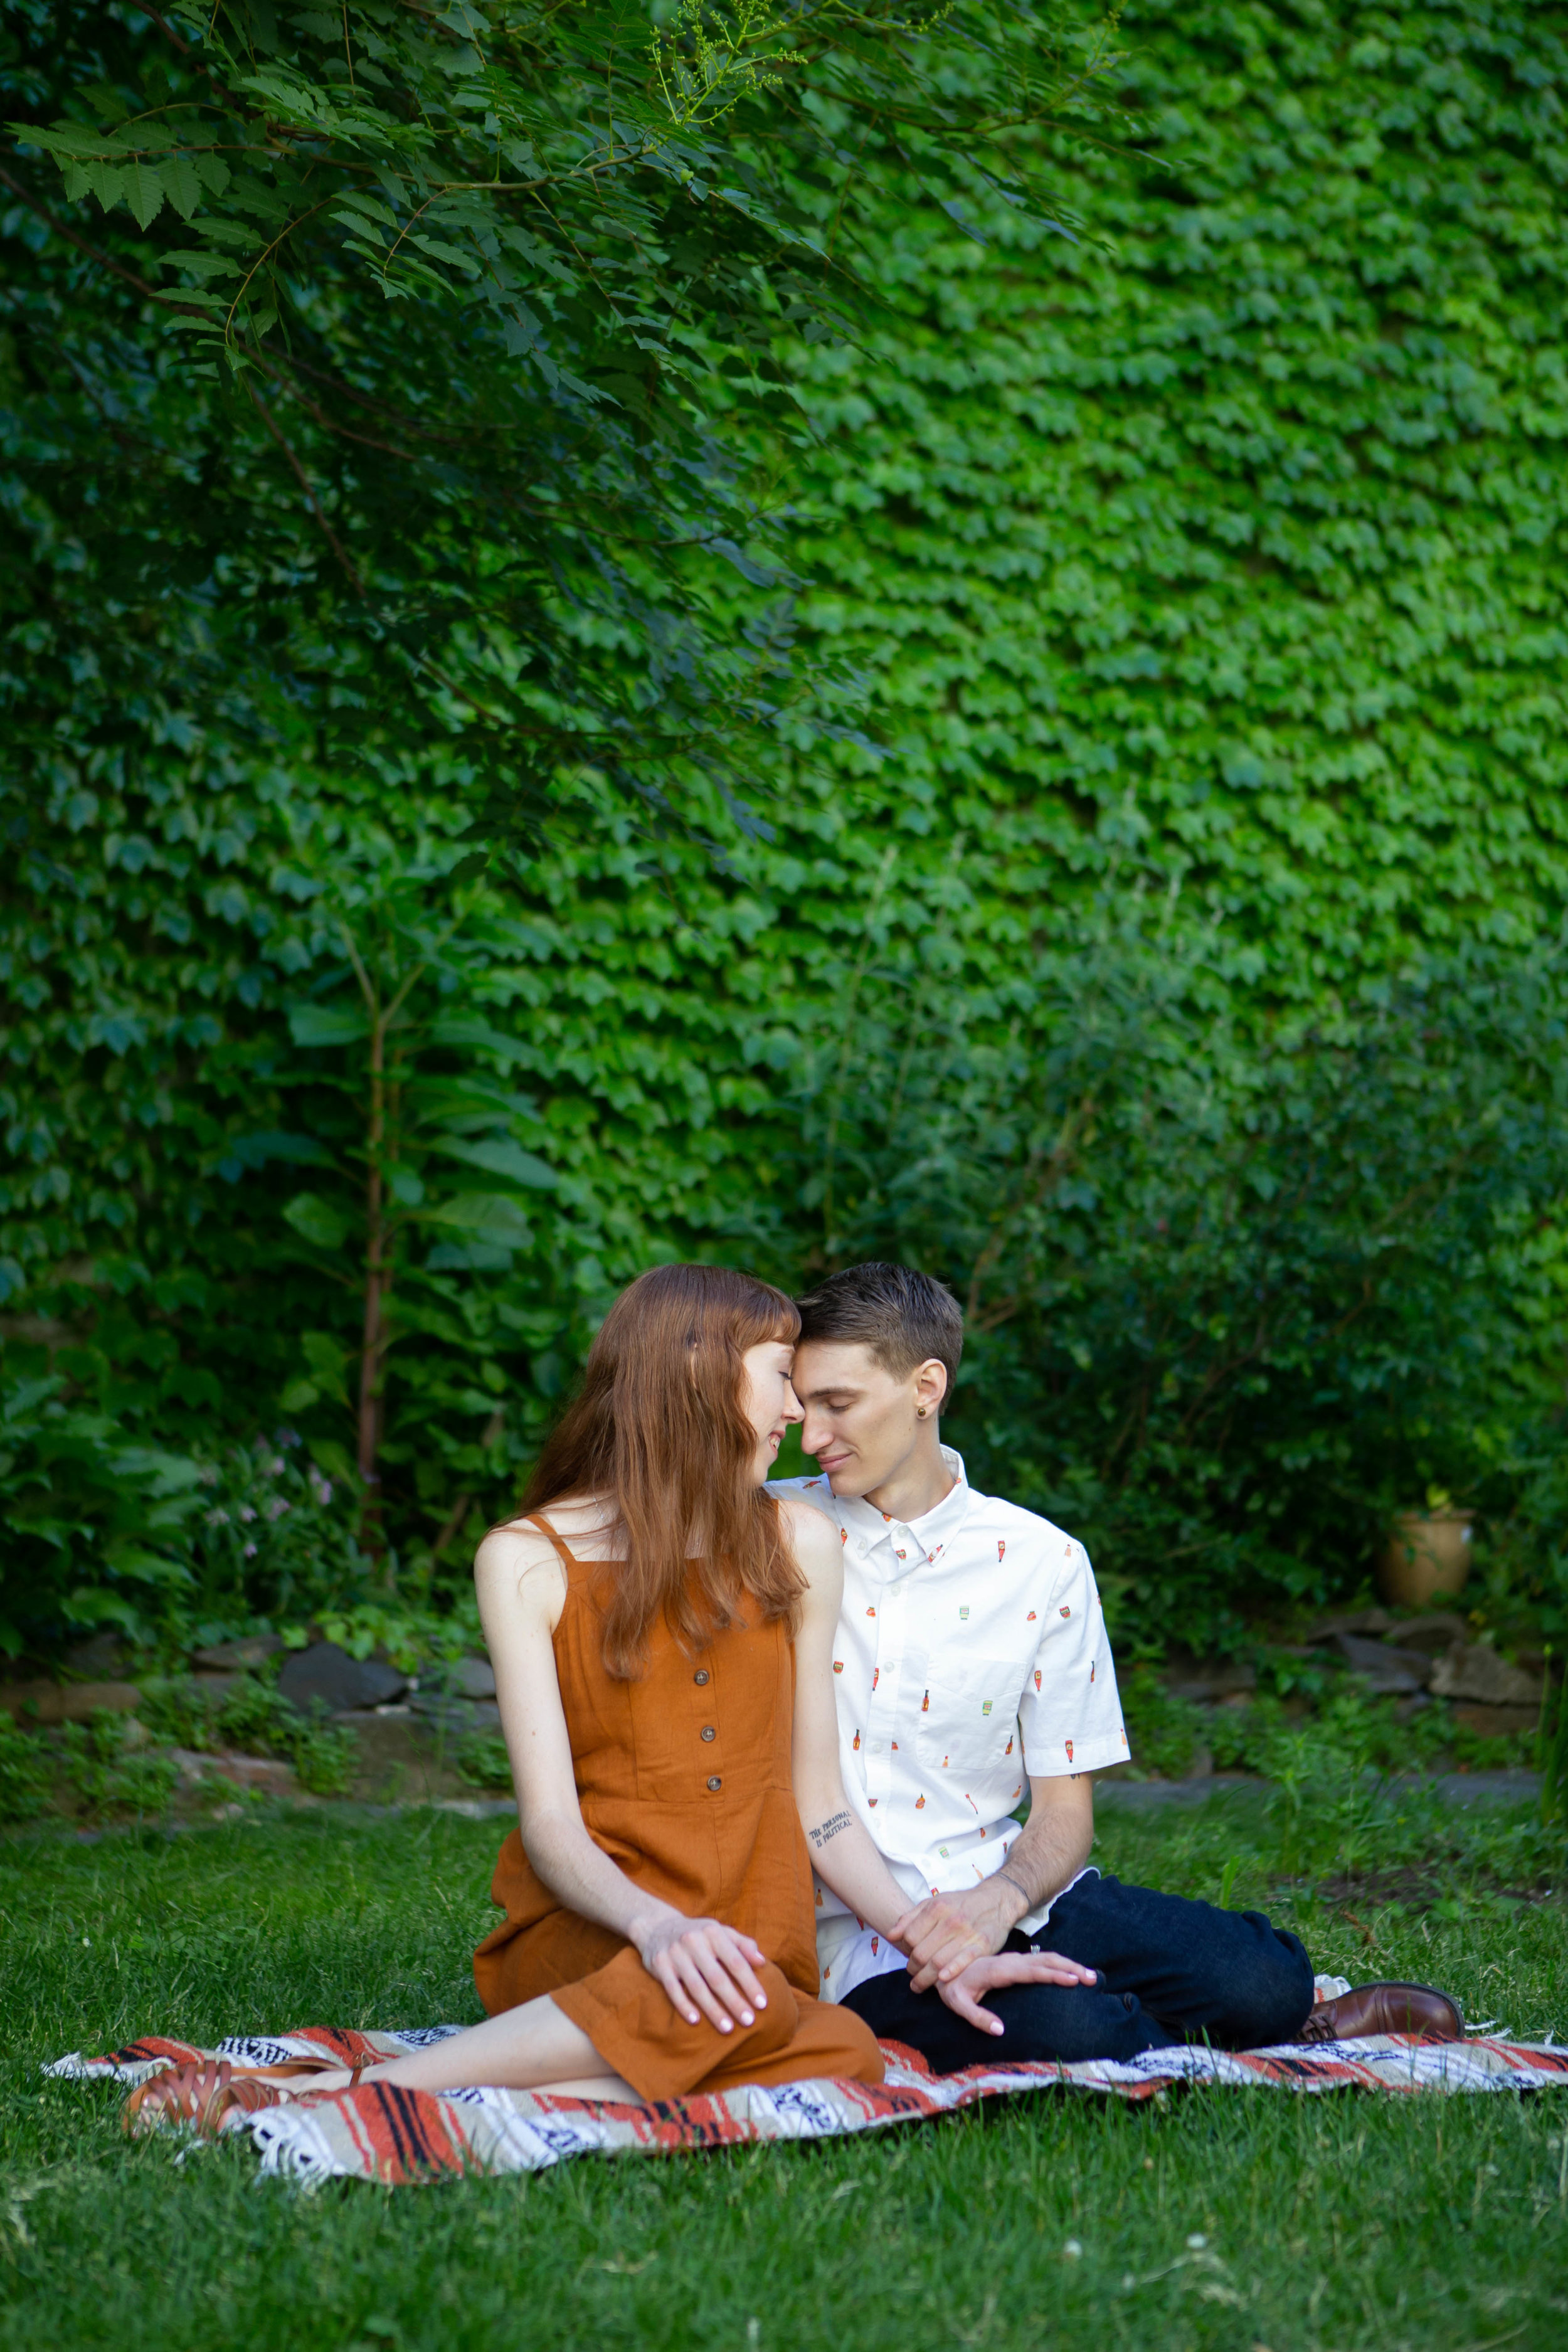 Kate-Alison-Photography-Madison-Alex-Central-Park-Engagement-Session-WEB-PREVIEW-3.jpg